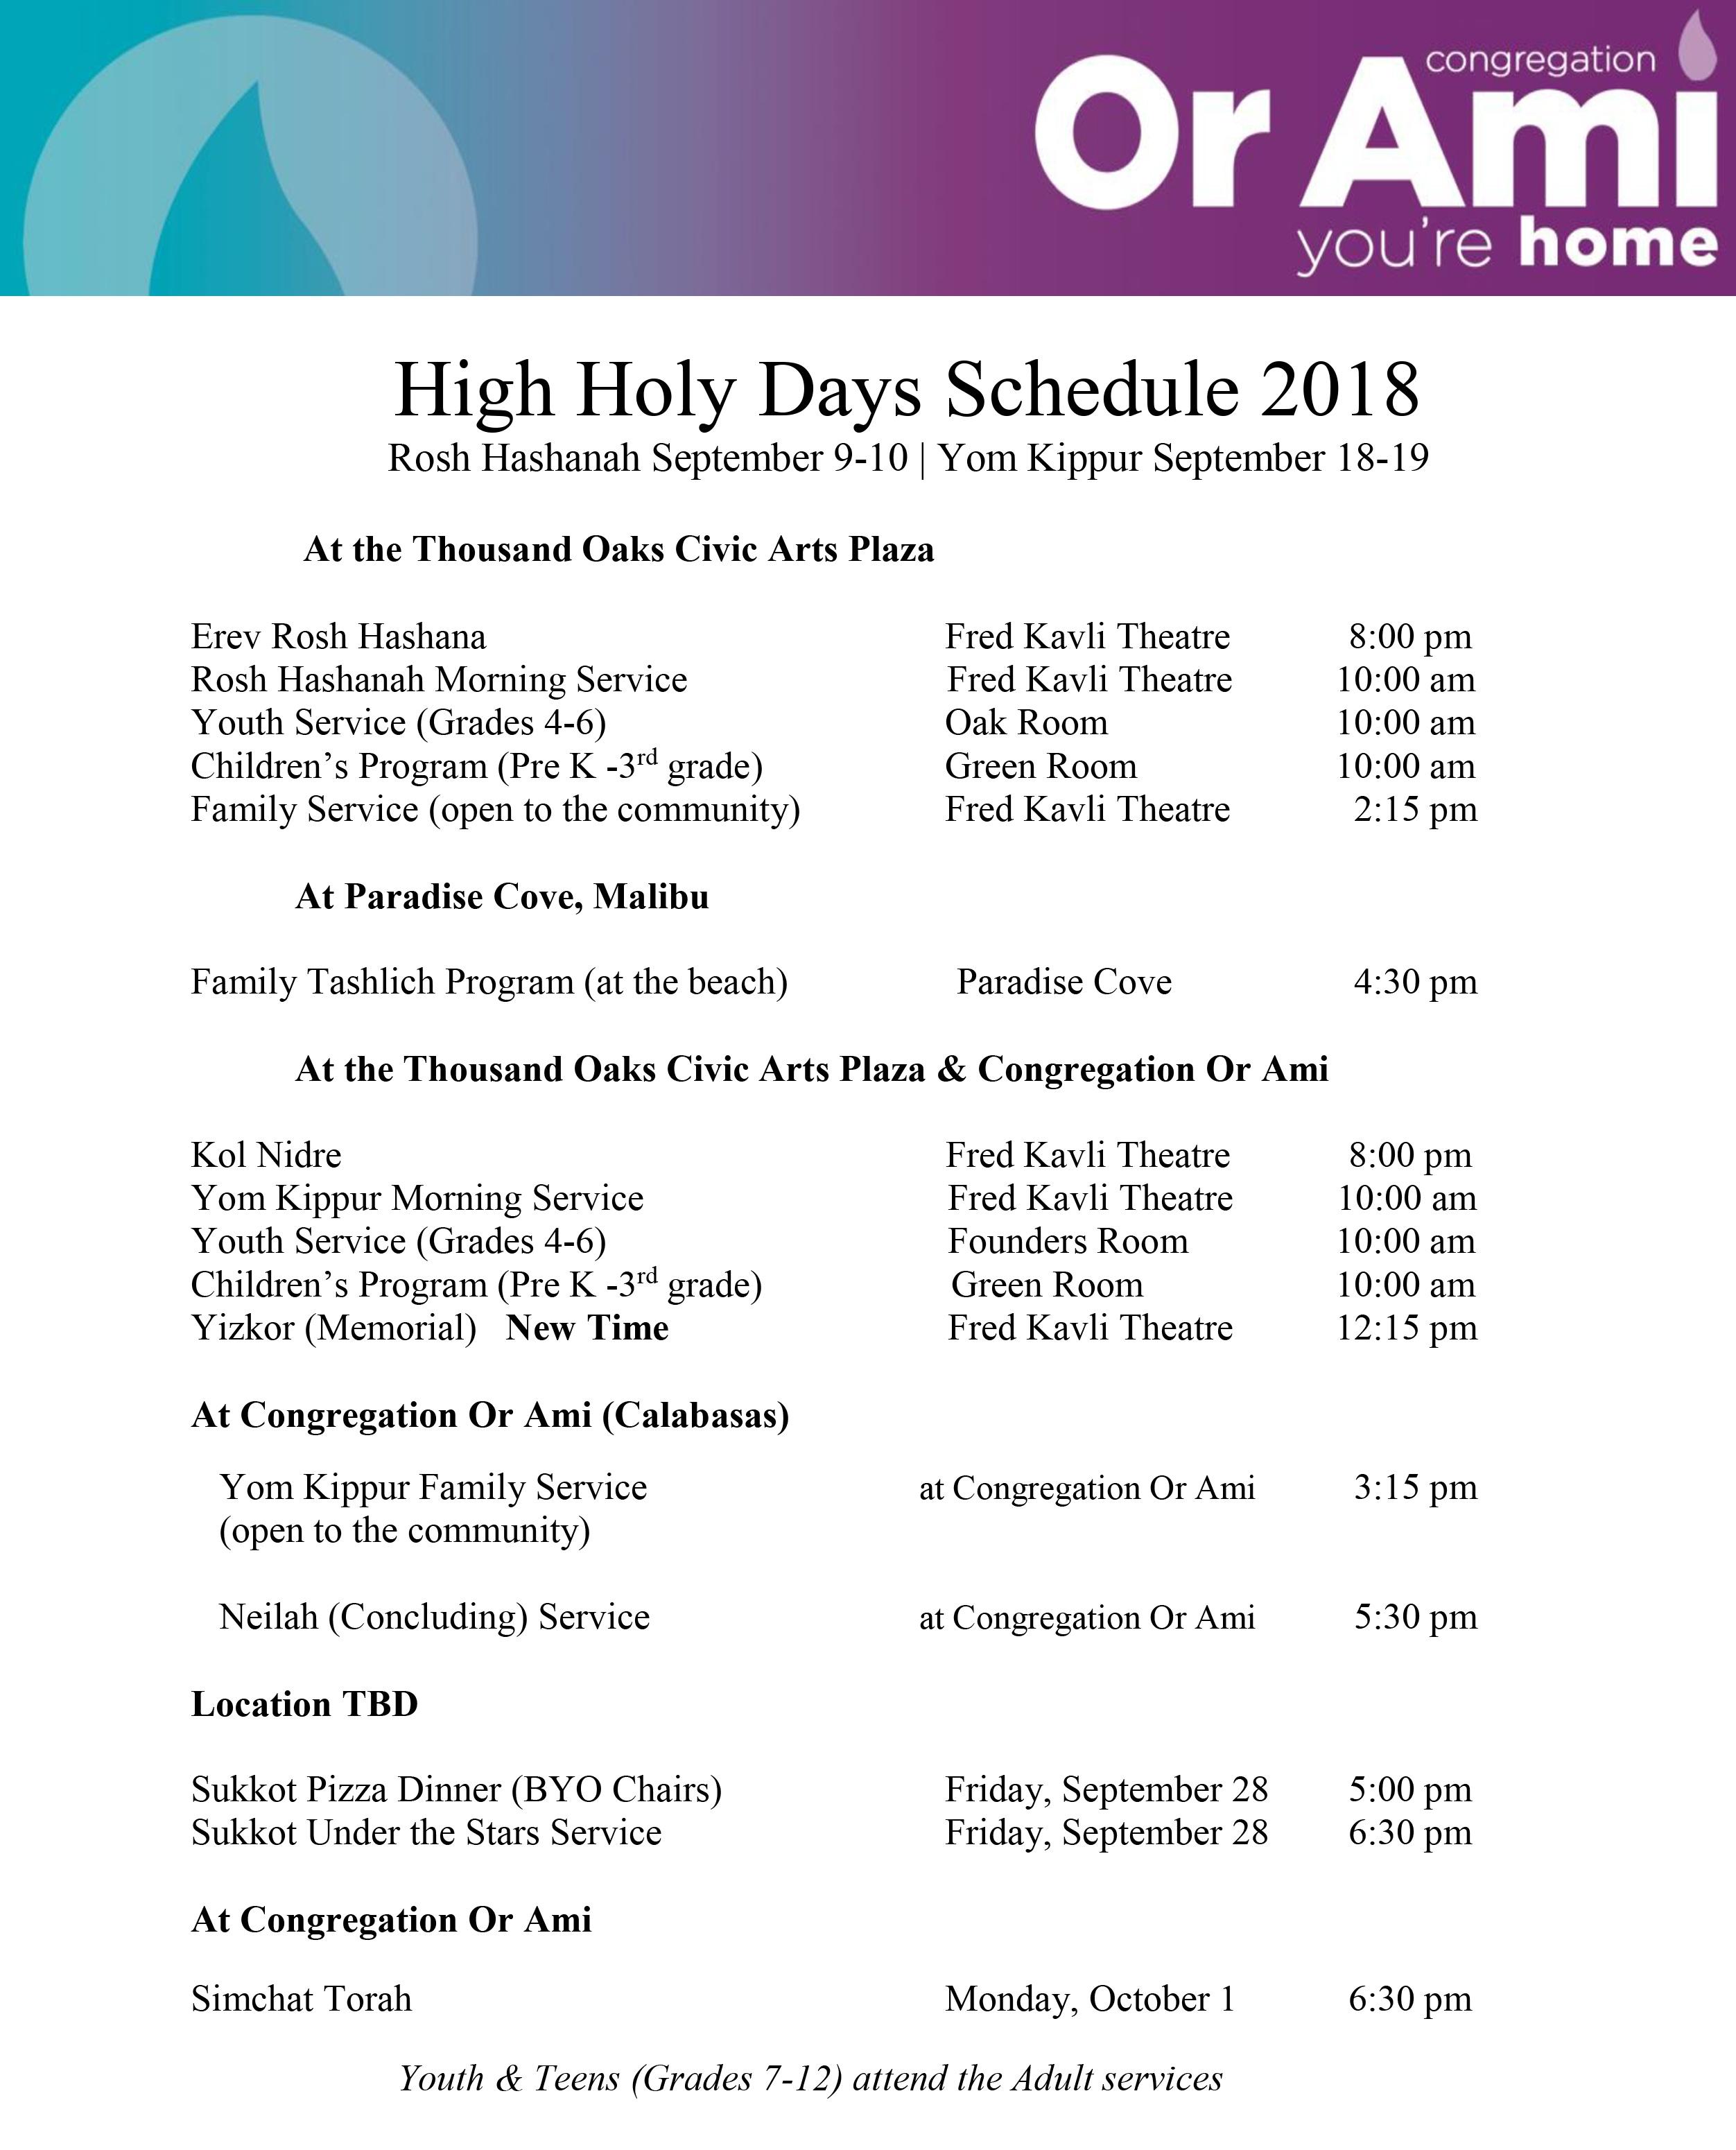 high holidays schedule or ami calabasas high holy days thumbnail v2